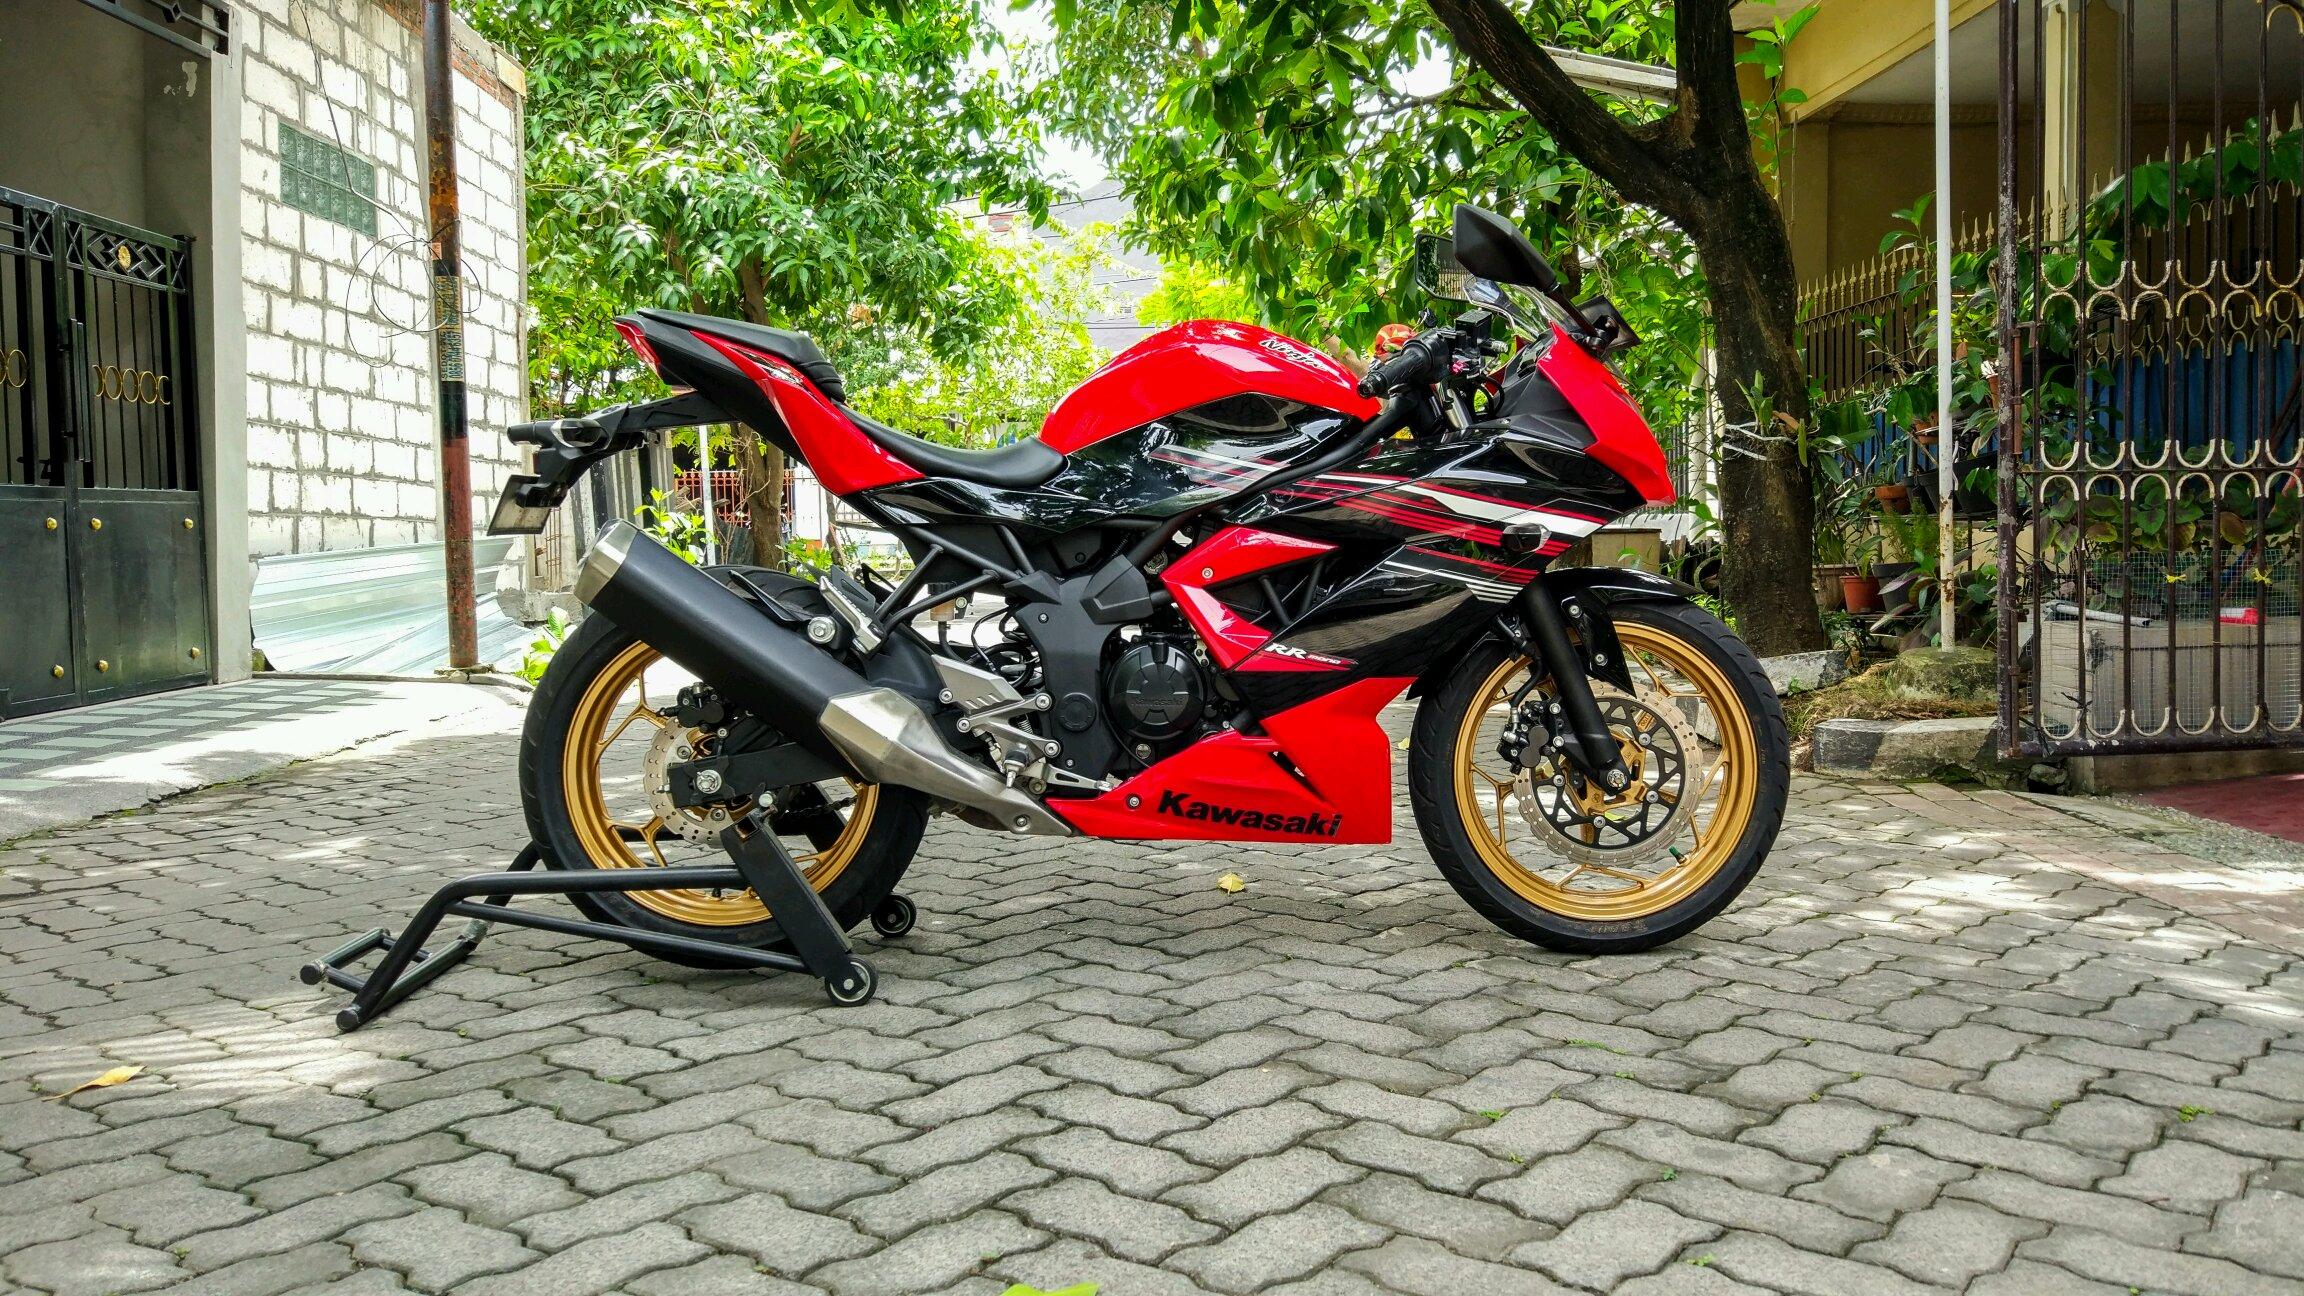 Kawasaki akan luncurkan rr mono versi naked